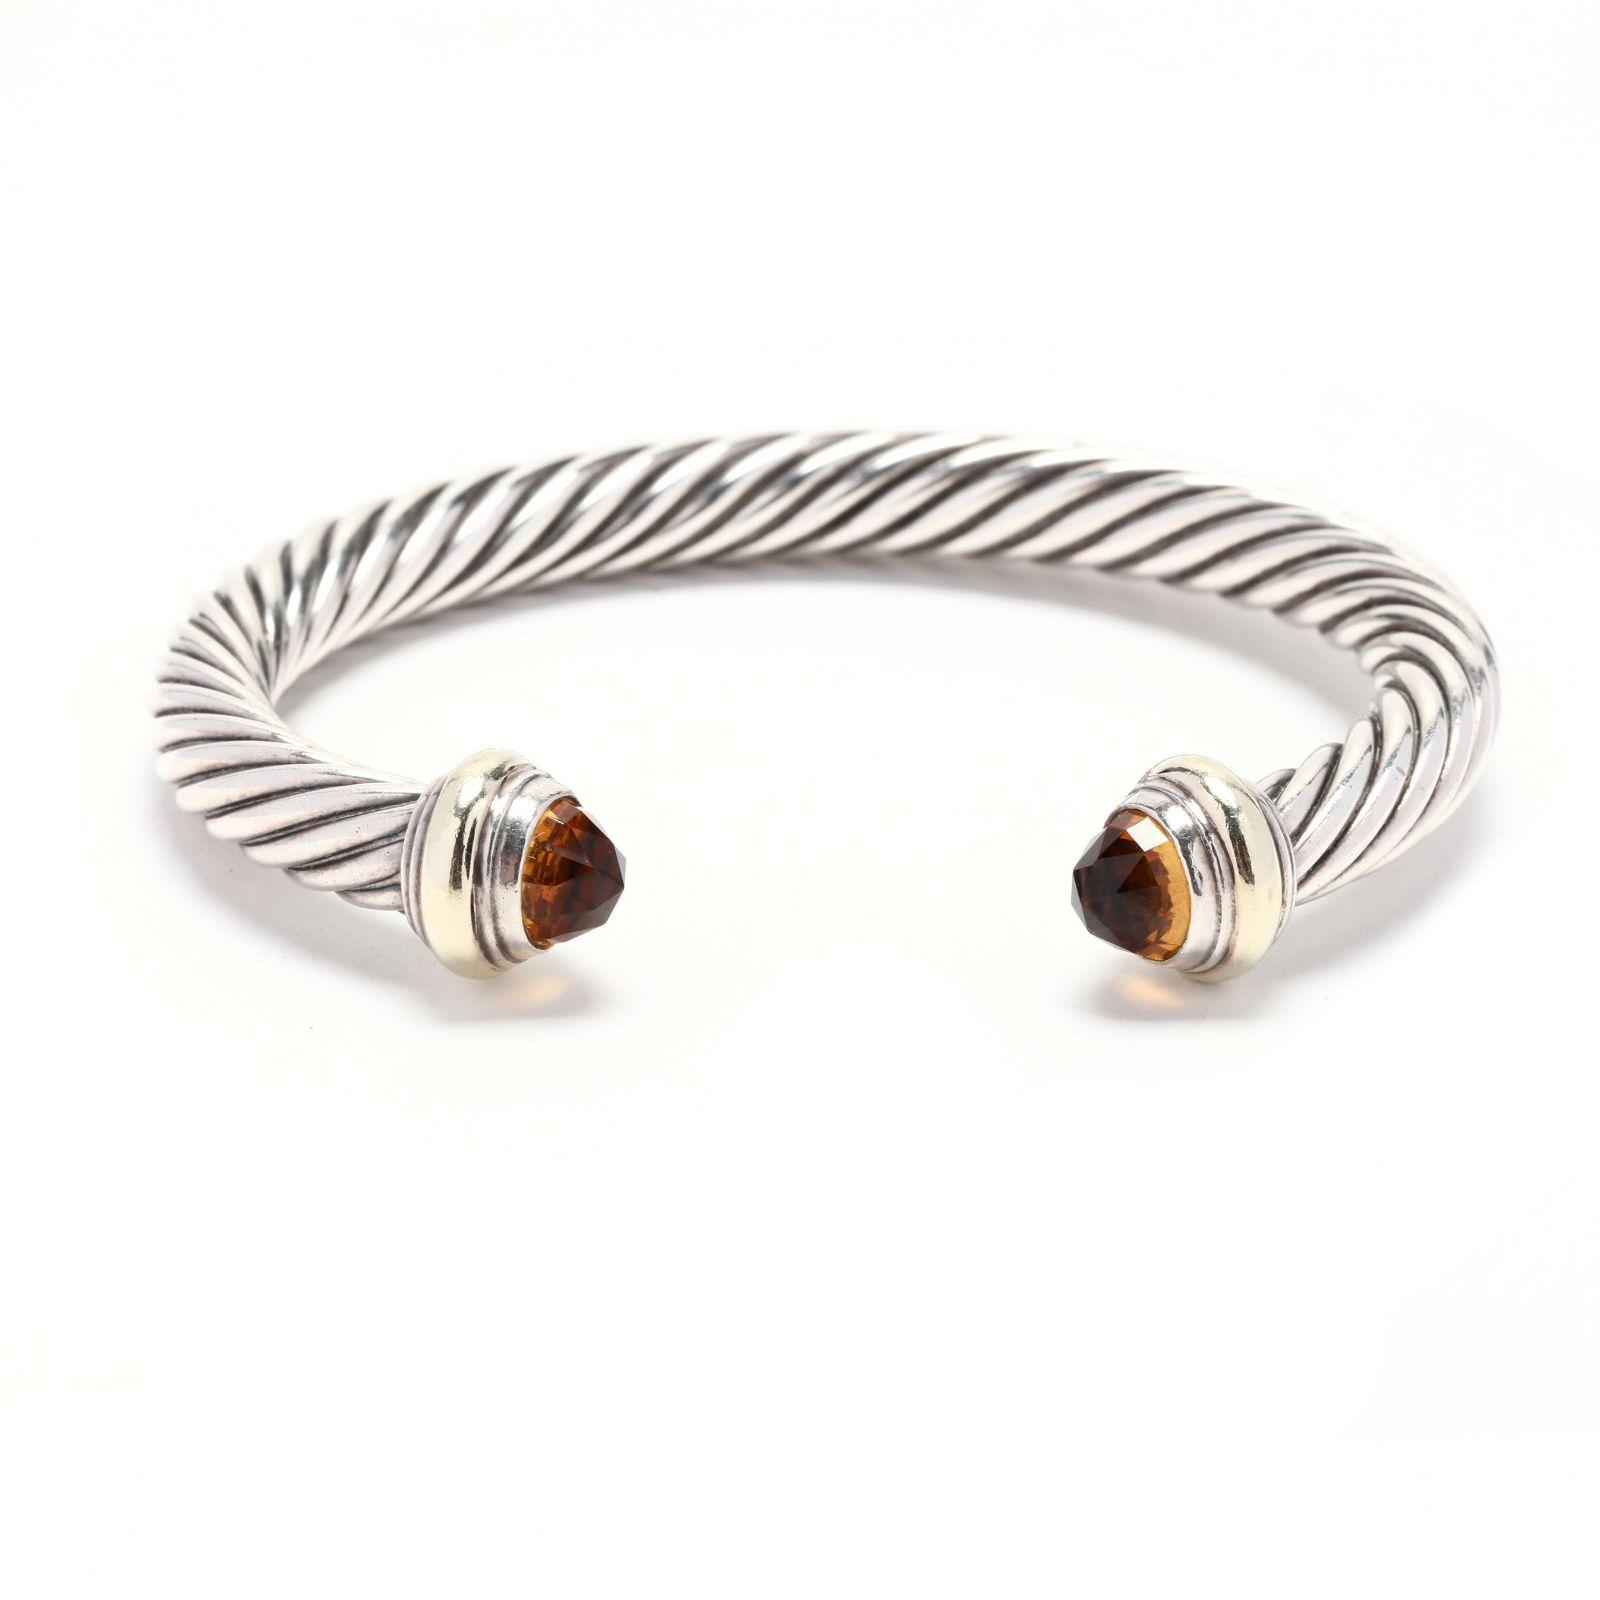 14KT Gold, Sterling Silver, and Citrine Cuff Bracelet,